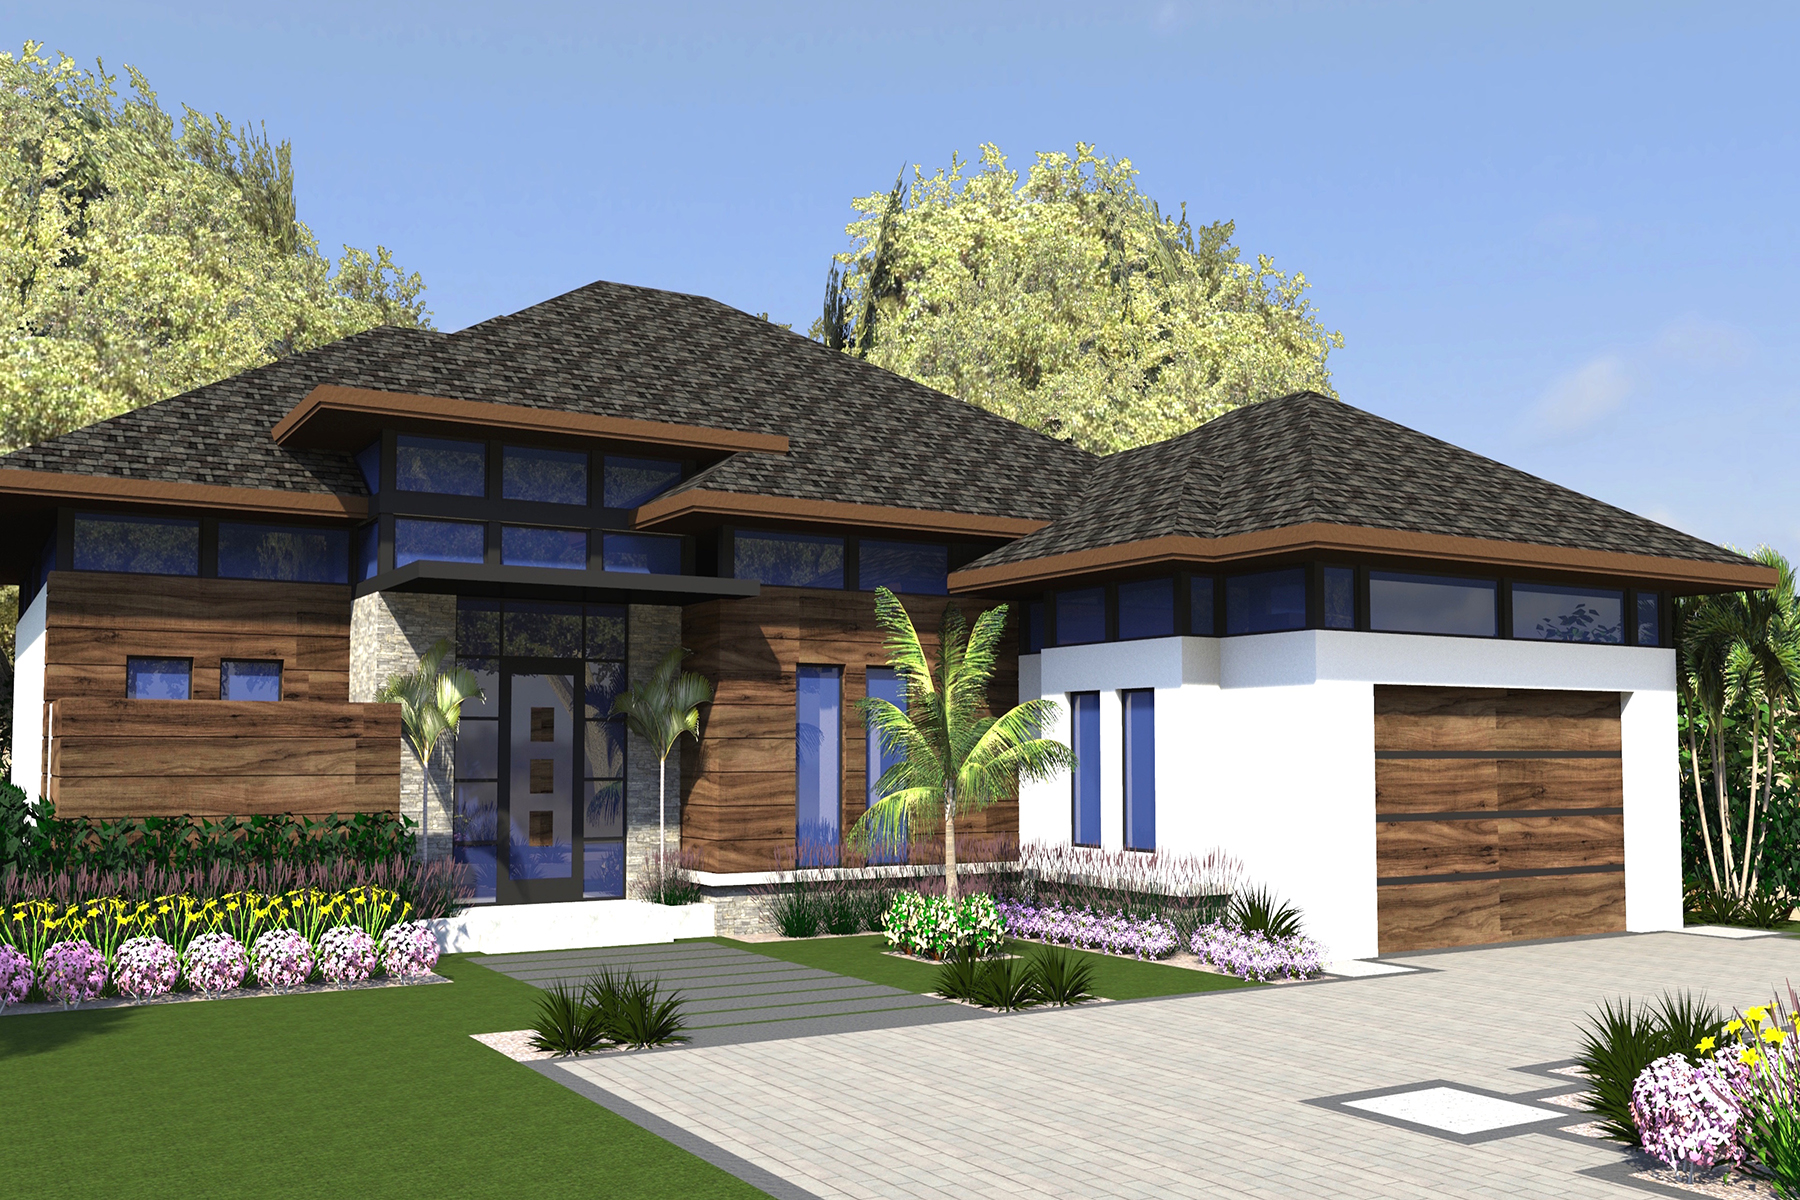 Villa per Vendita alle ore LEGACY ESTATES 598 Lakeland Ave Lot 3 Naples, Florida, 34110 Stati Uniti